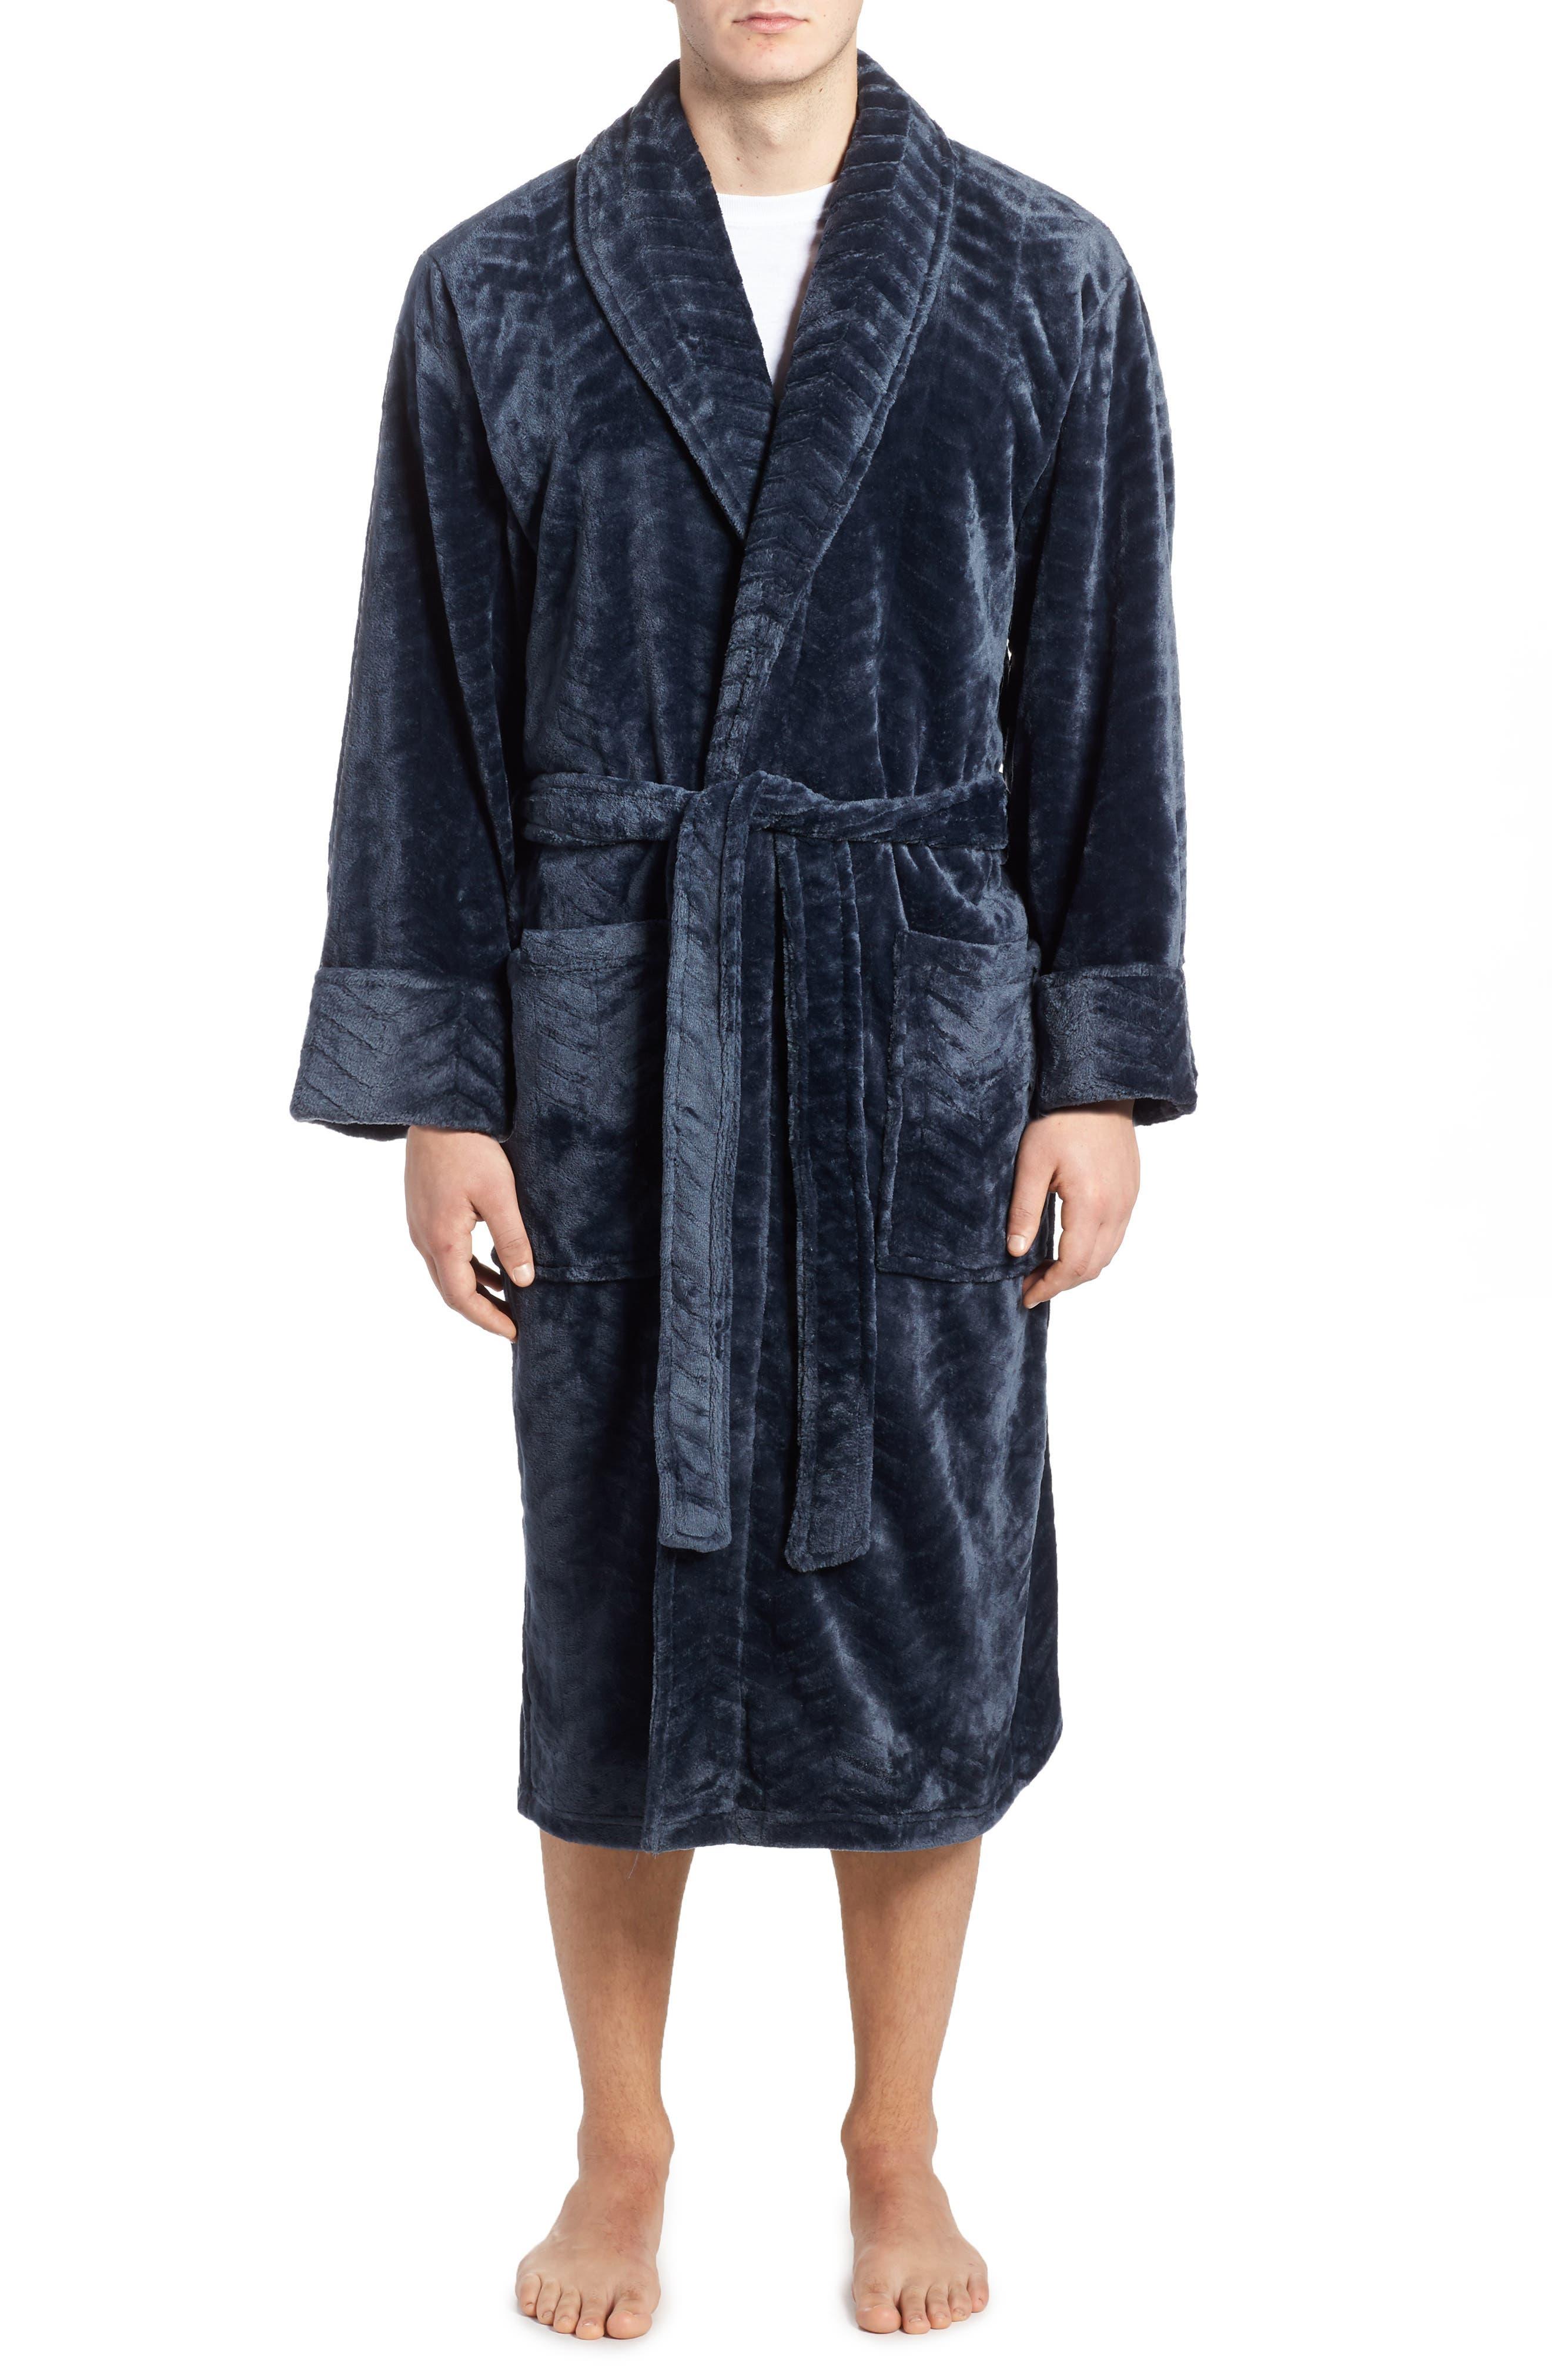 Daniel Buchler Chevron Stripe Fleece Robe